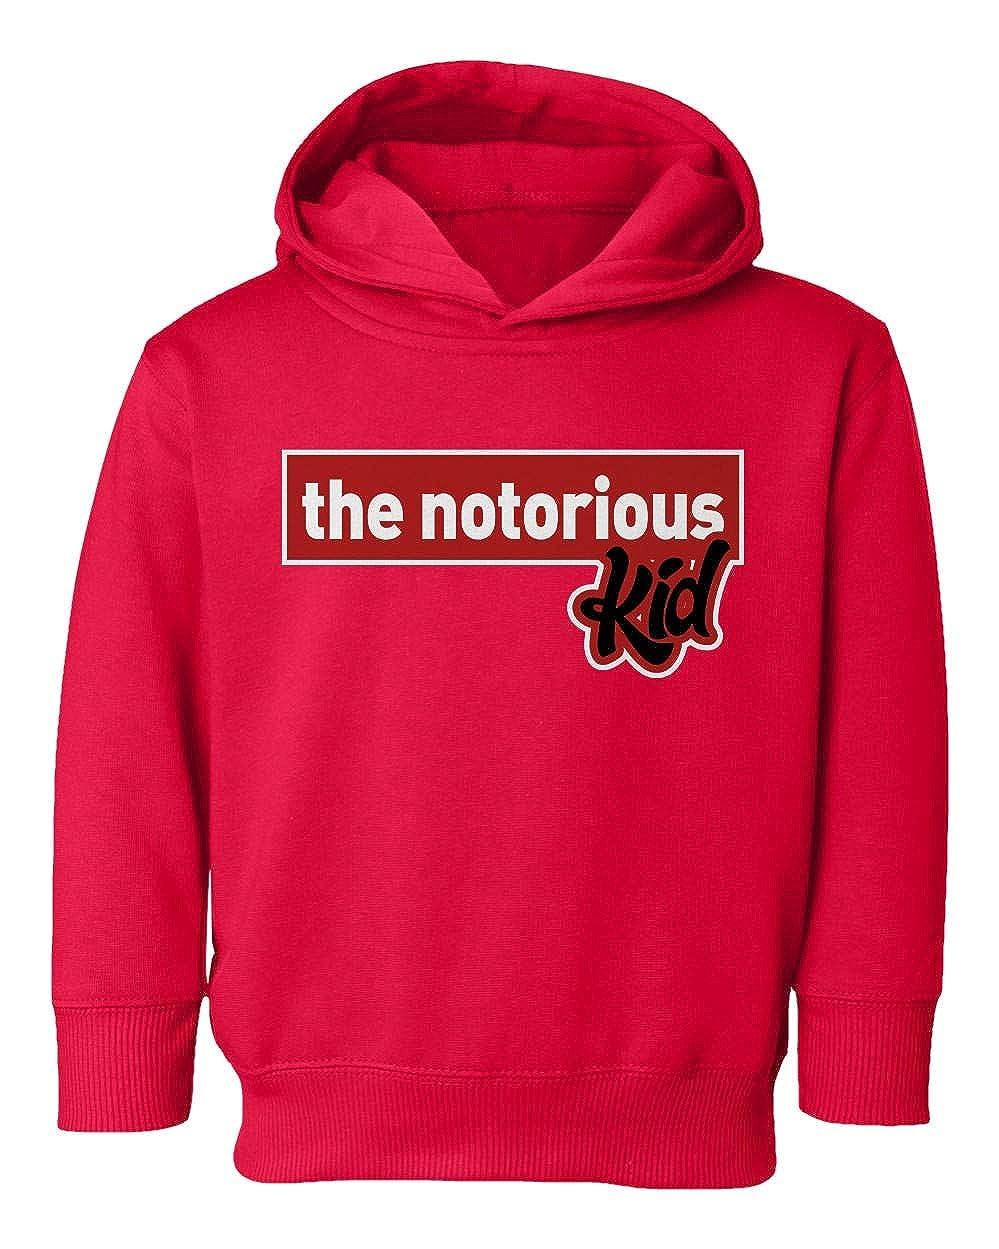 Societee Notorious Kid Funny Biggie Smalls Parody Girls Boys Toddler Hooded Sweatshirt